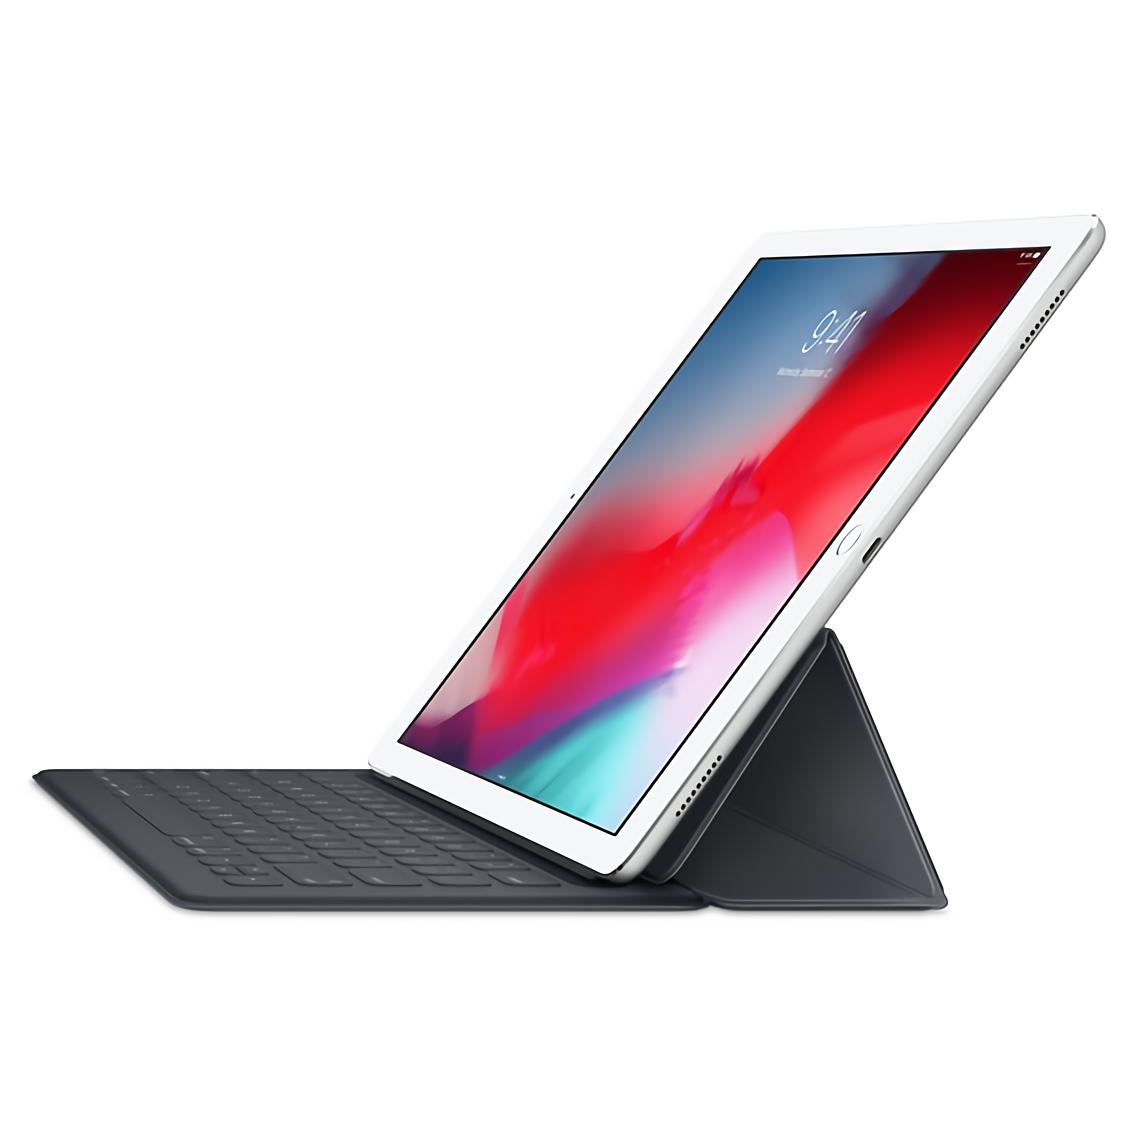 ★每月4 / 14 / 24號 點數三倍★ Apple Smart Keyboard for 12.9吋 iPad Pro (美式英文) 佳成數位 0